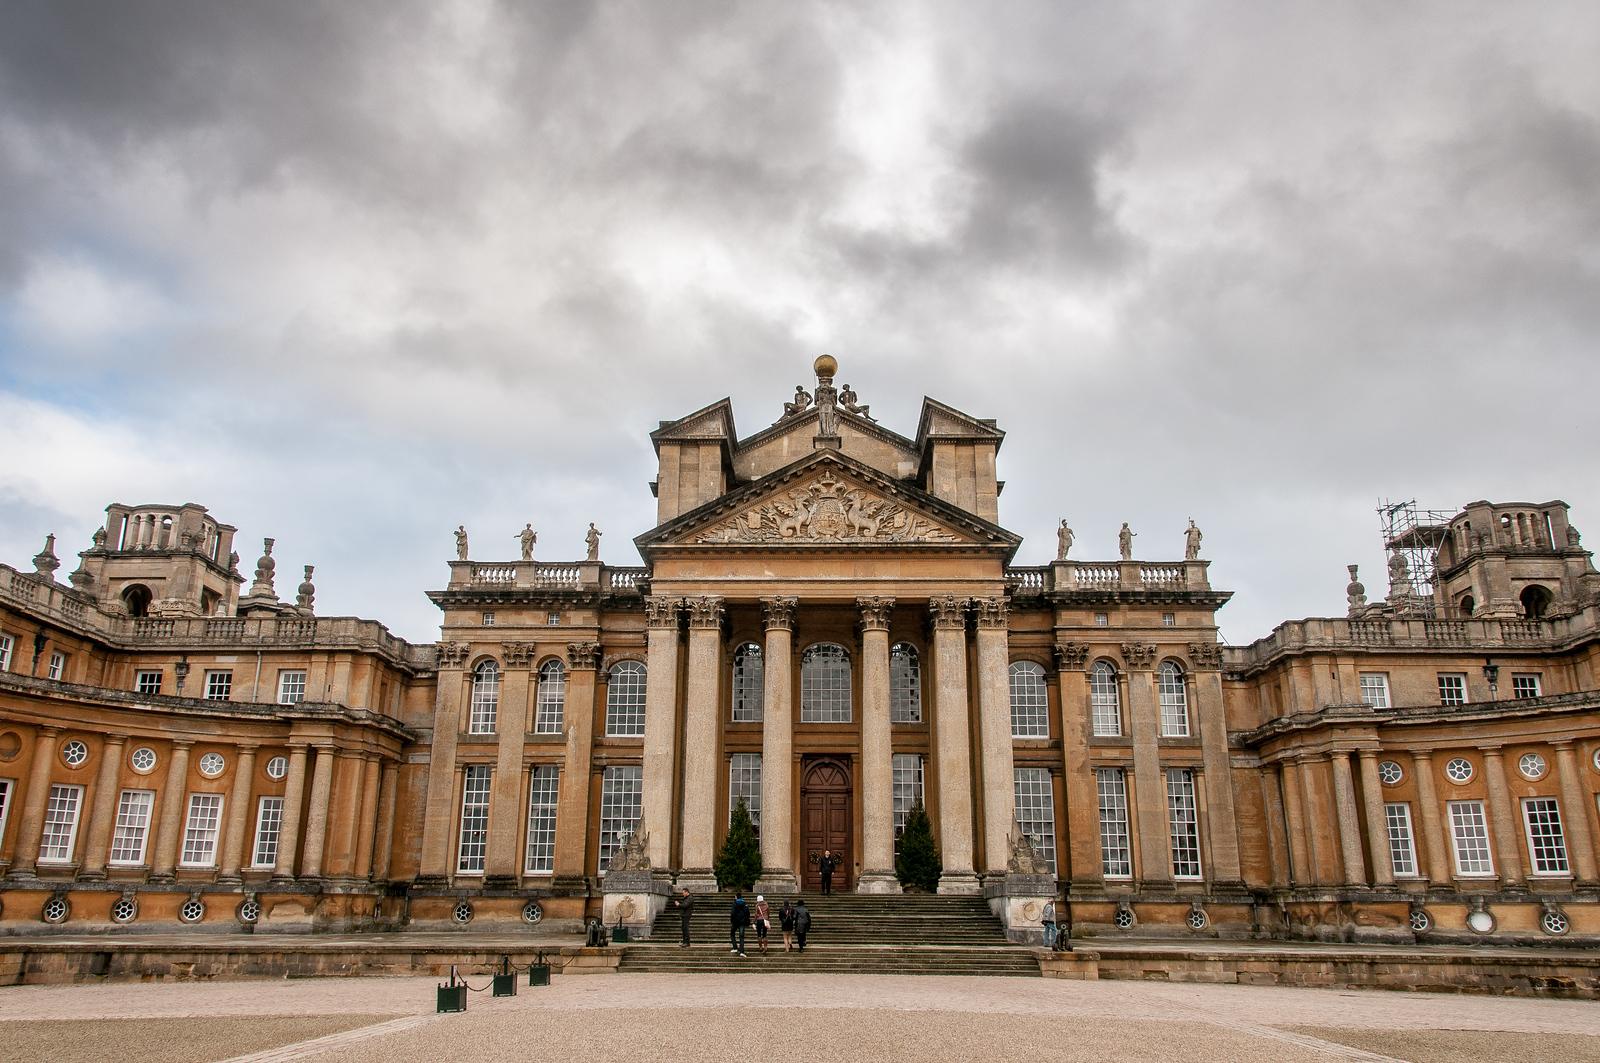 Blenheim Palace UNESCO World Heritage Site